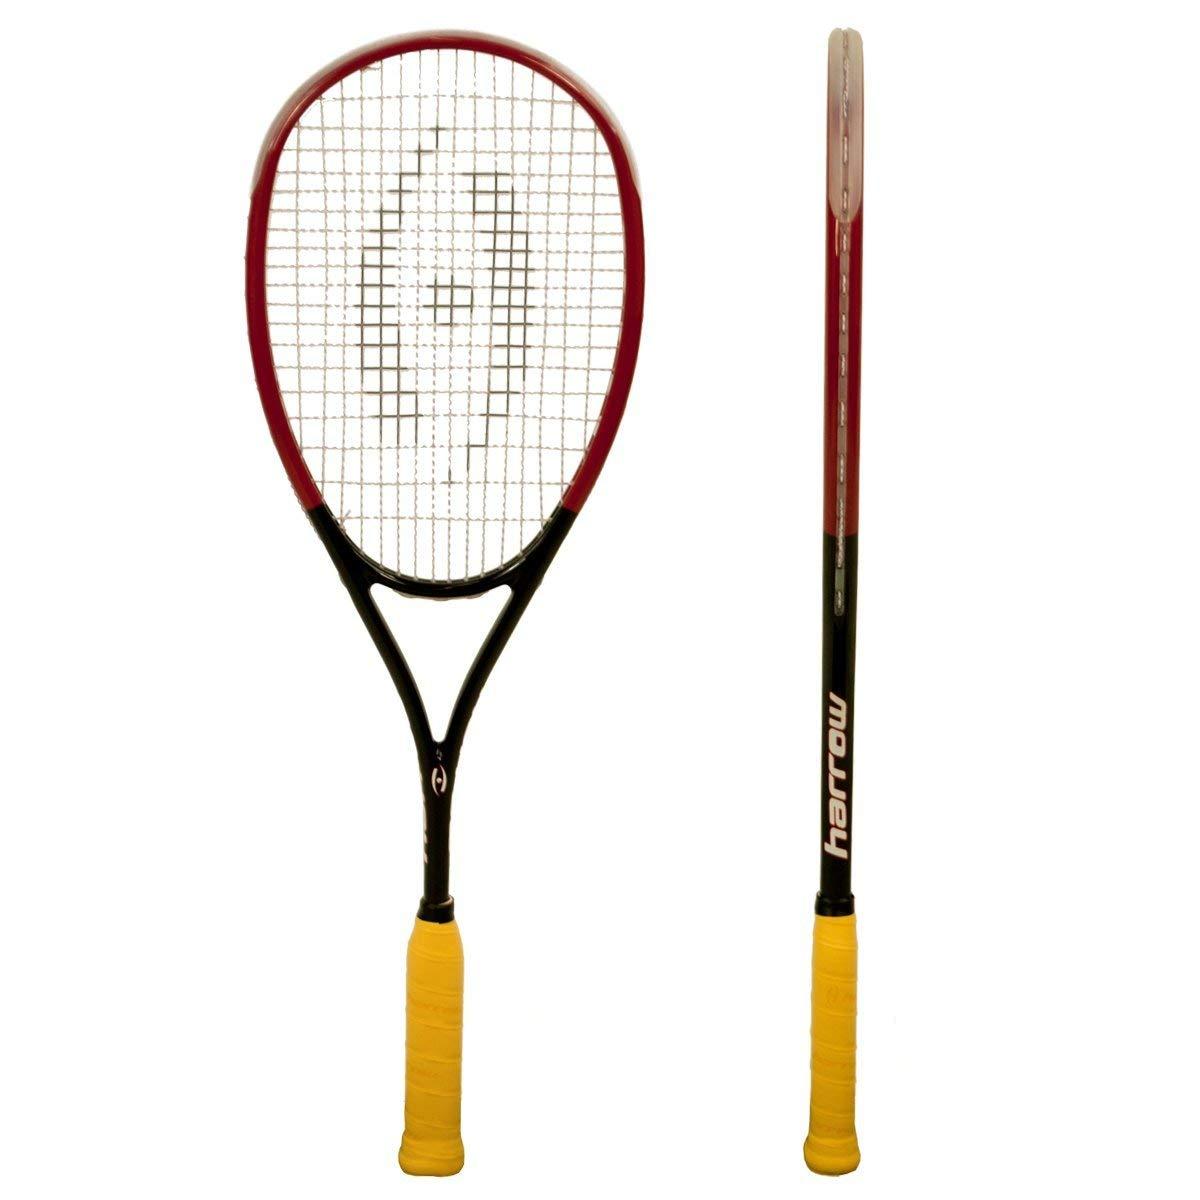 Harrow 65920502 2016 M-140 Squash Racquet, Black/Red/White